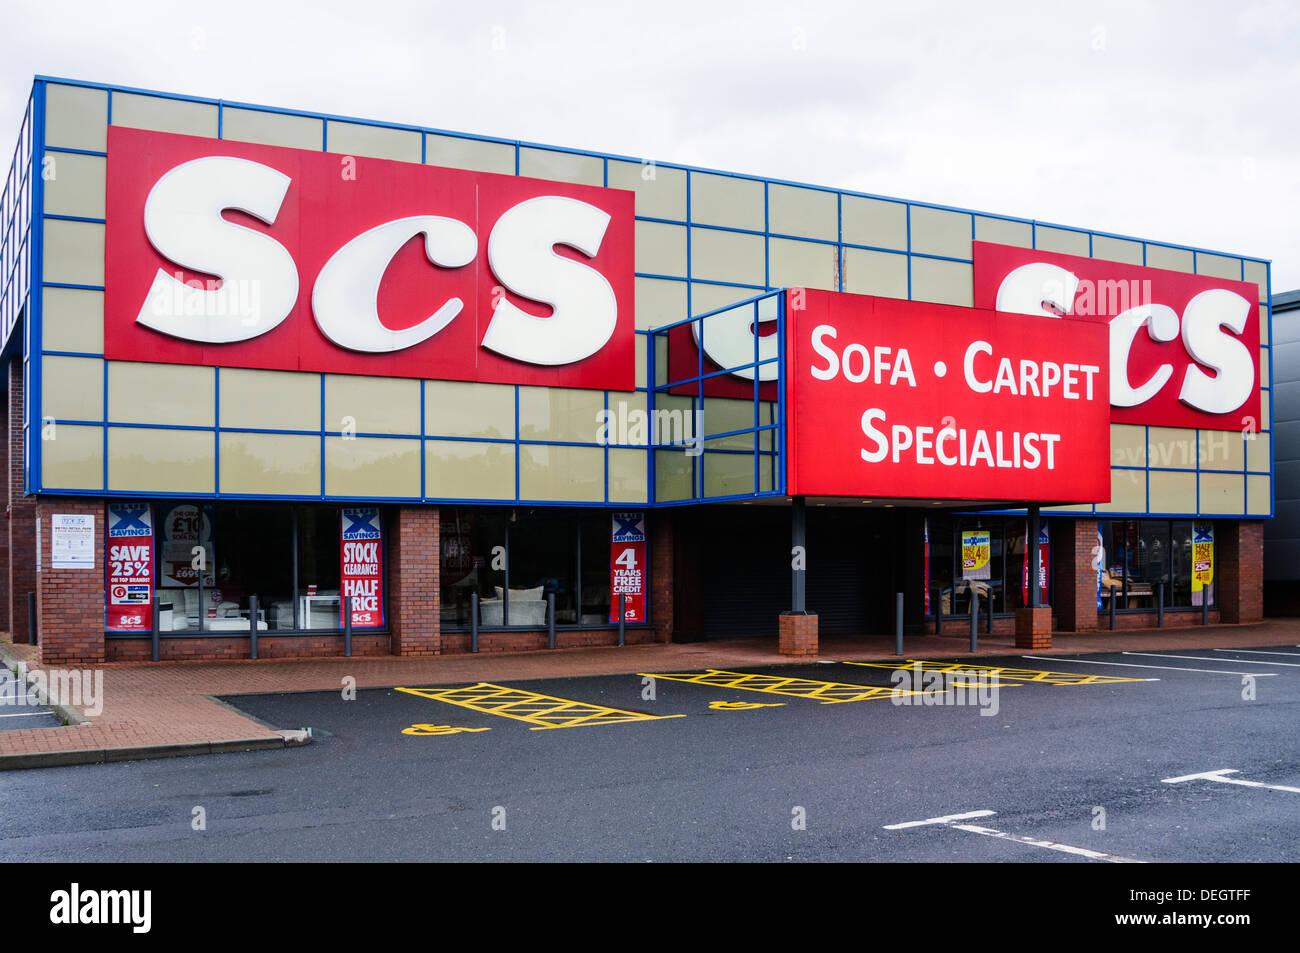 SCS furniture store Stock Photo